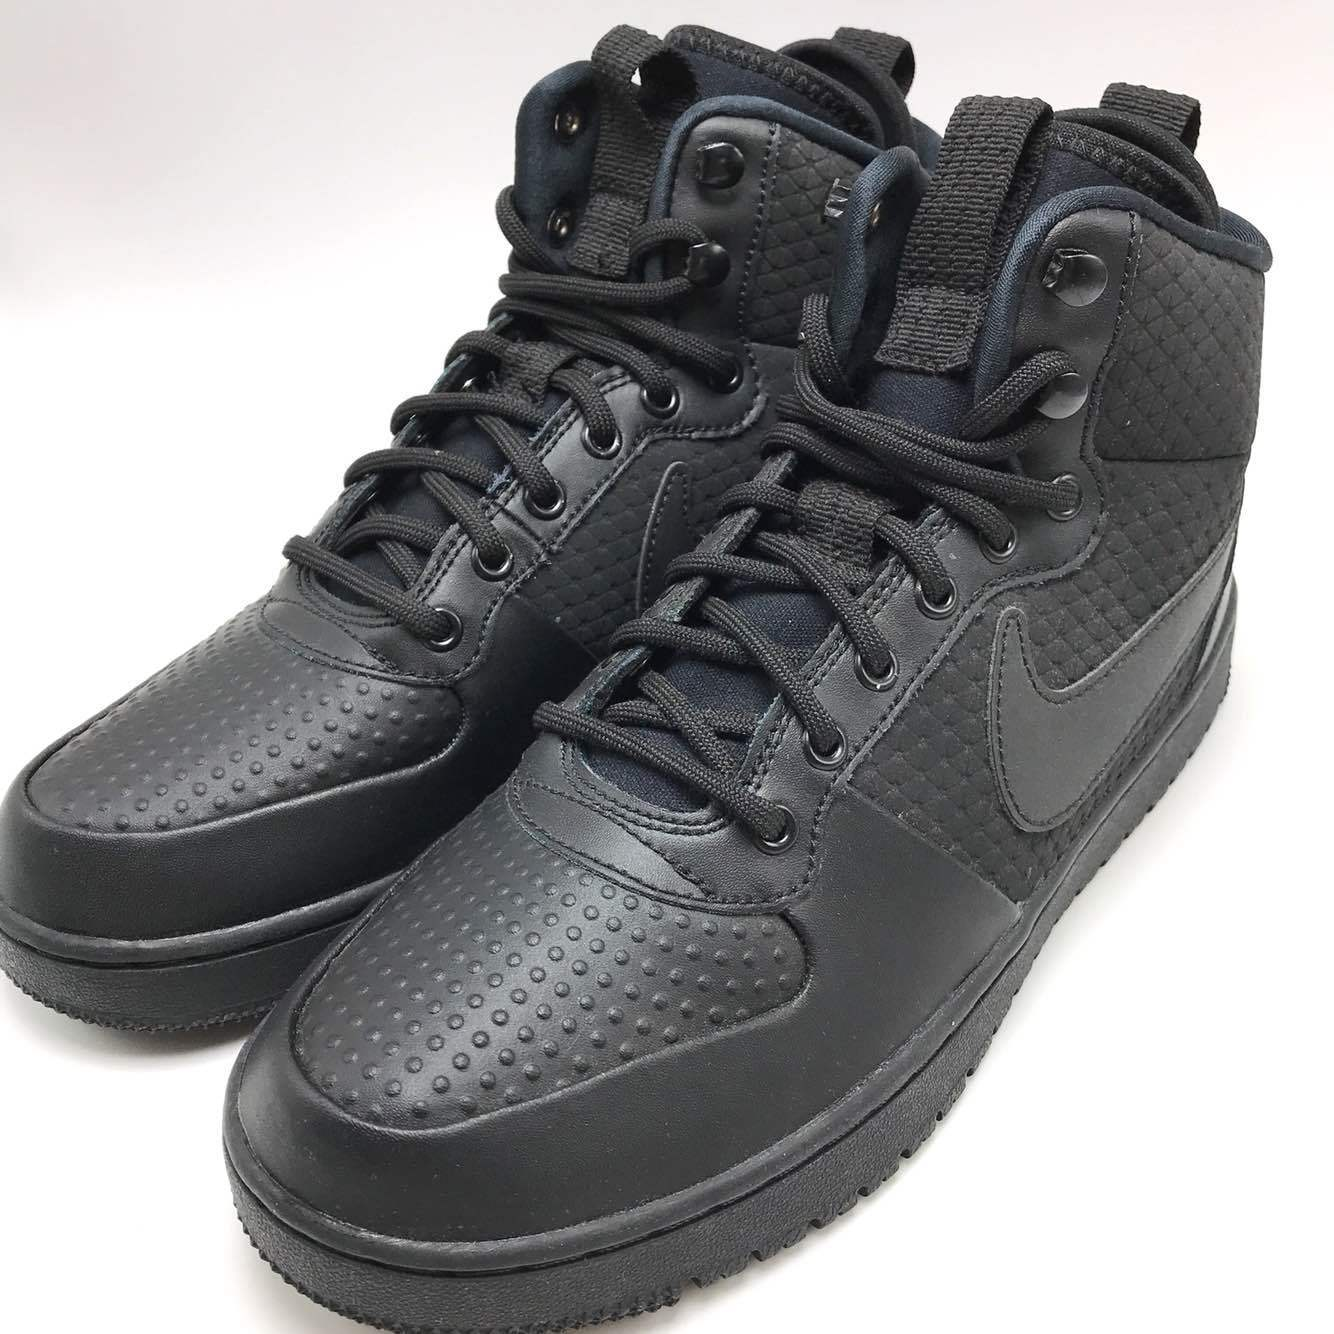 Nike Court Borough MID Winter Men's shoes Black/Black AA0547-002